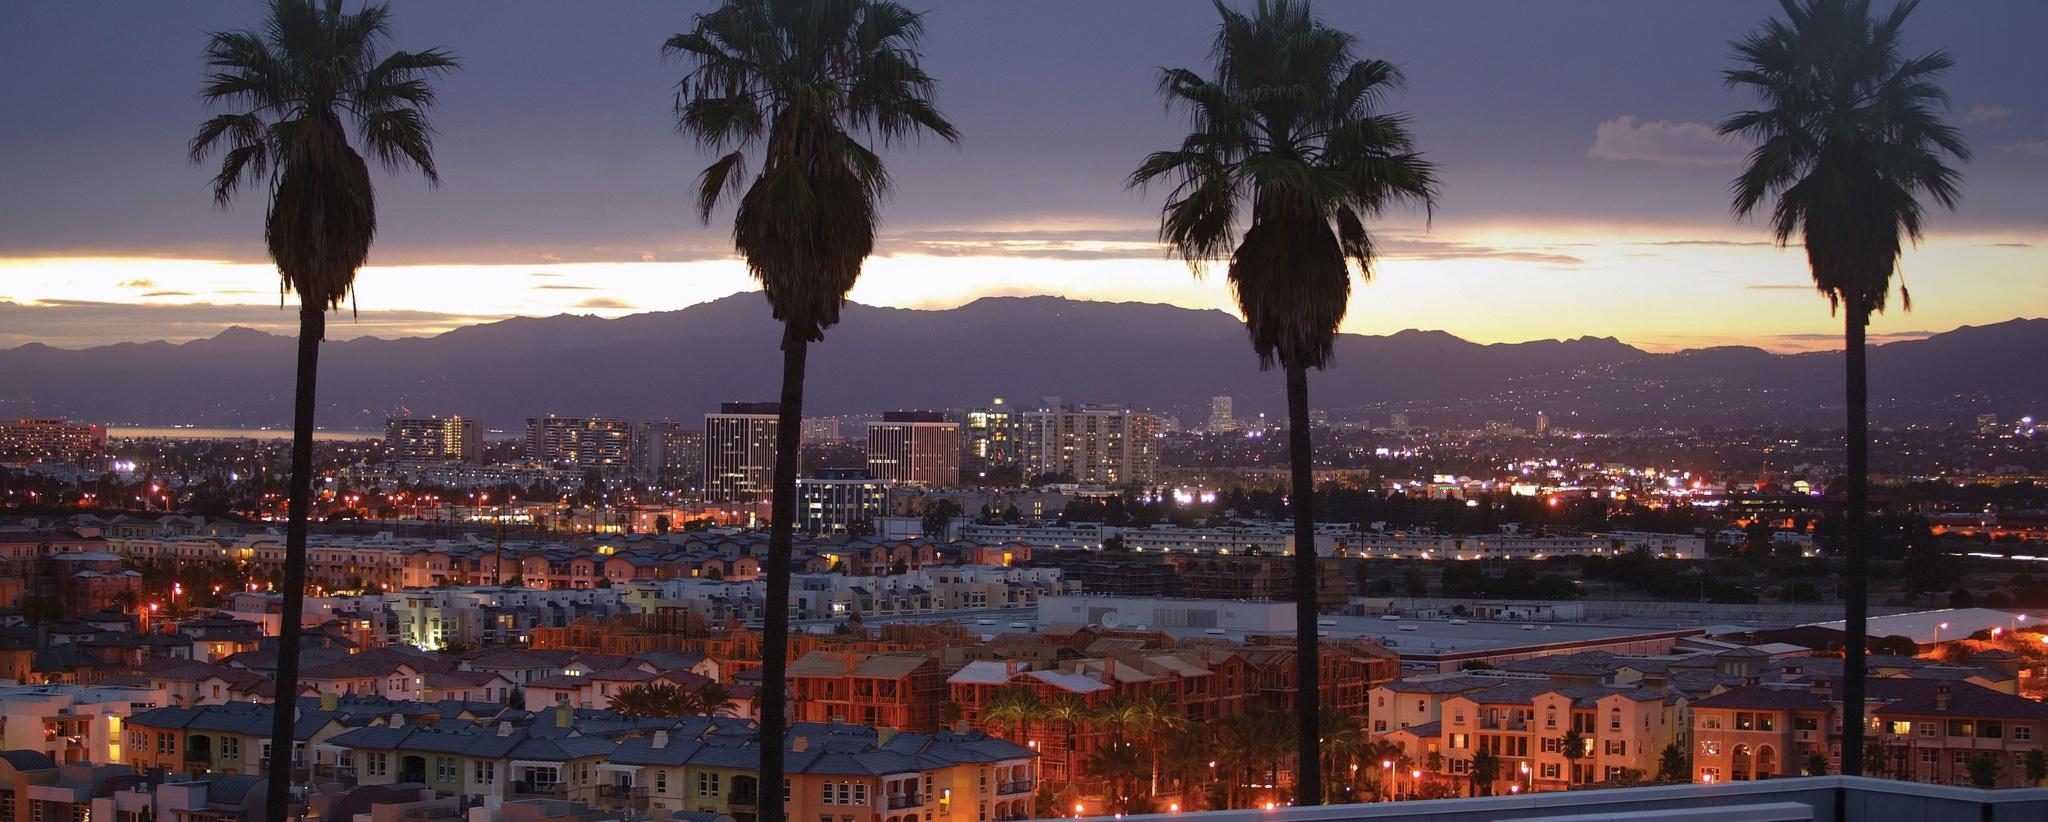 LA landscape at night.